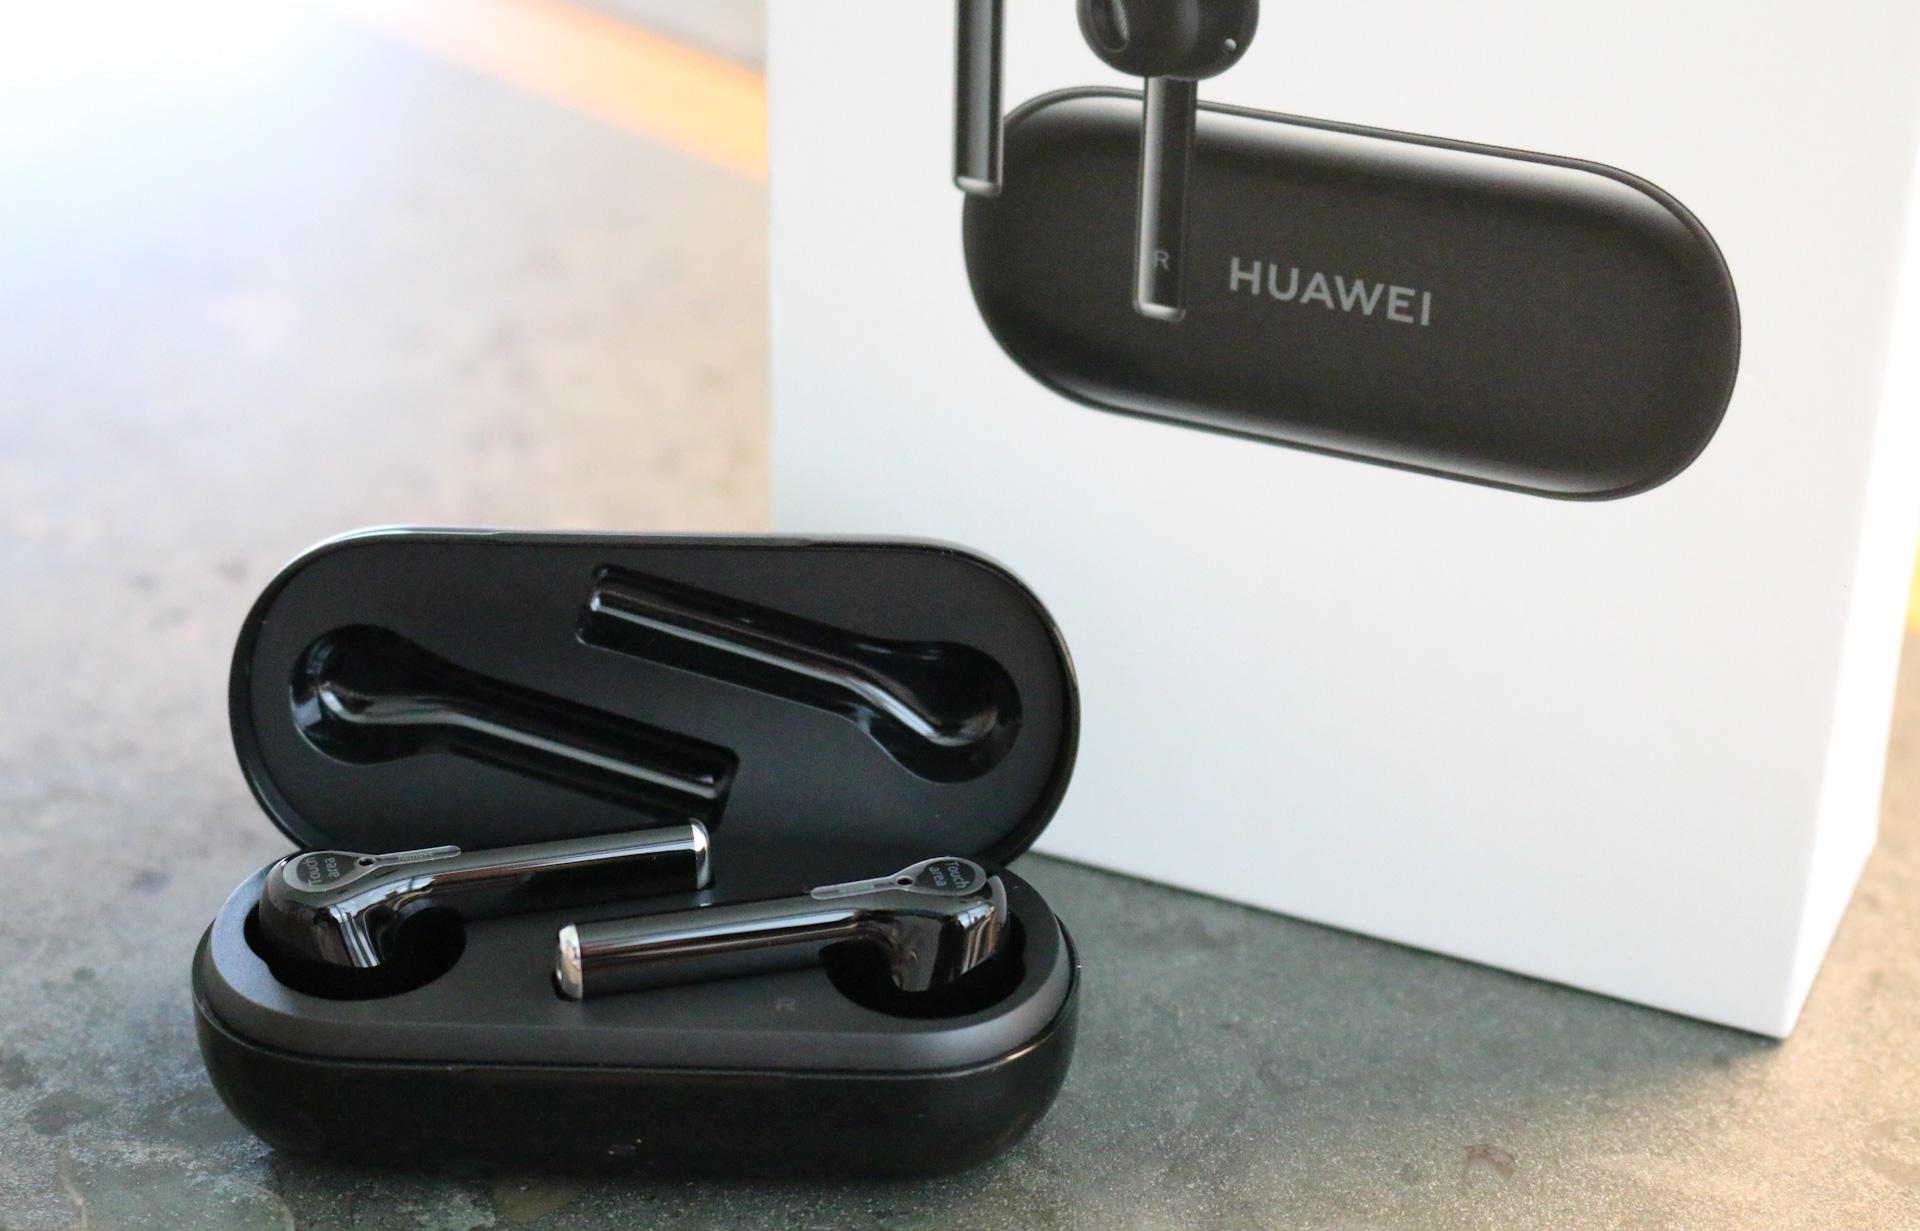 Huawei-FreeBuds-3i-review-3